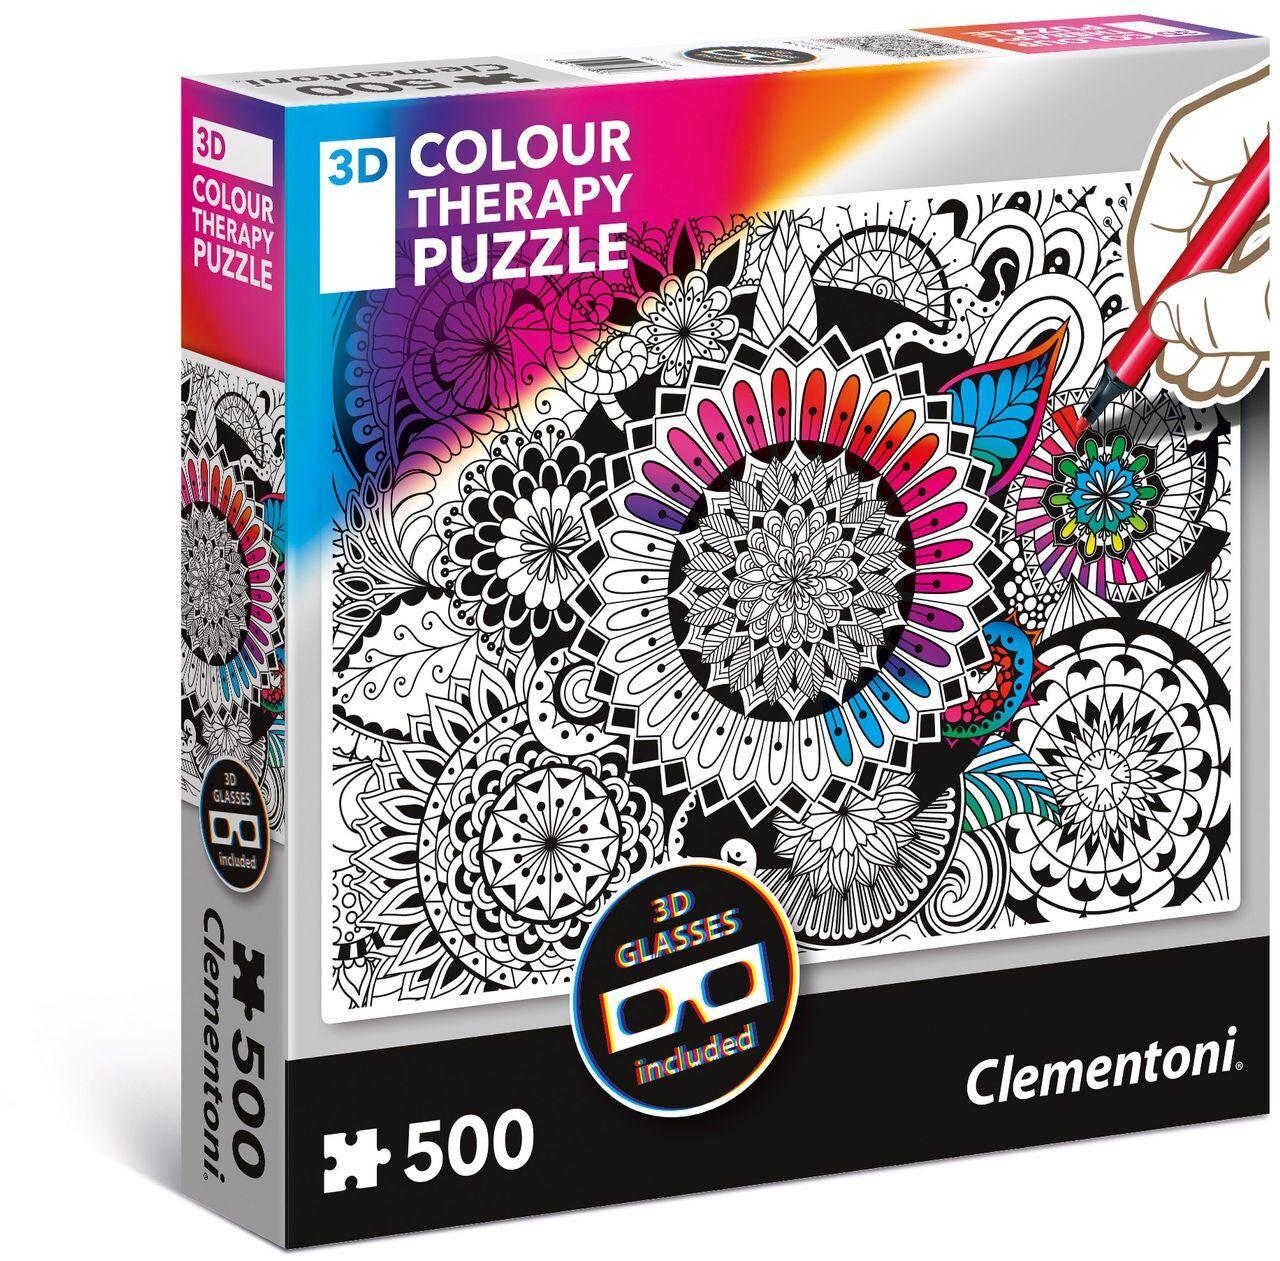 Clementoni Male Selv 3D Puslespill Mandala 500 Brikker